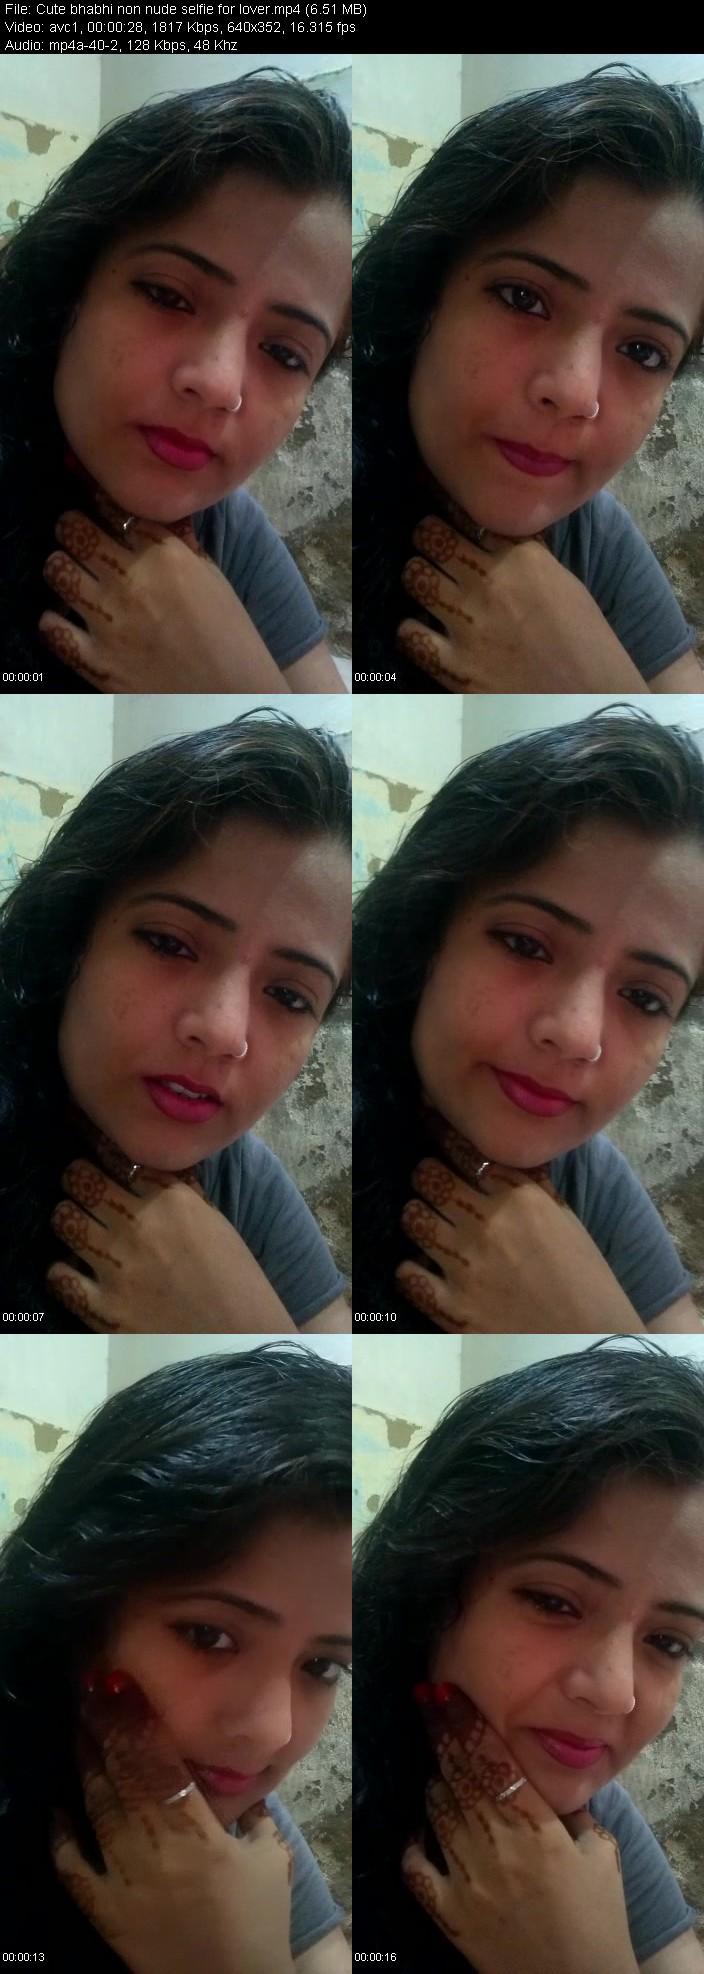 [Image: Cute_bhabhi_non_nude_selfie_for_lover.jpg]